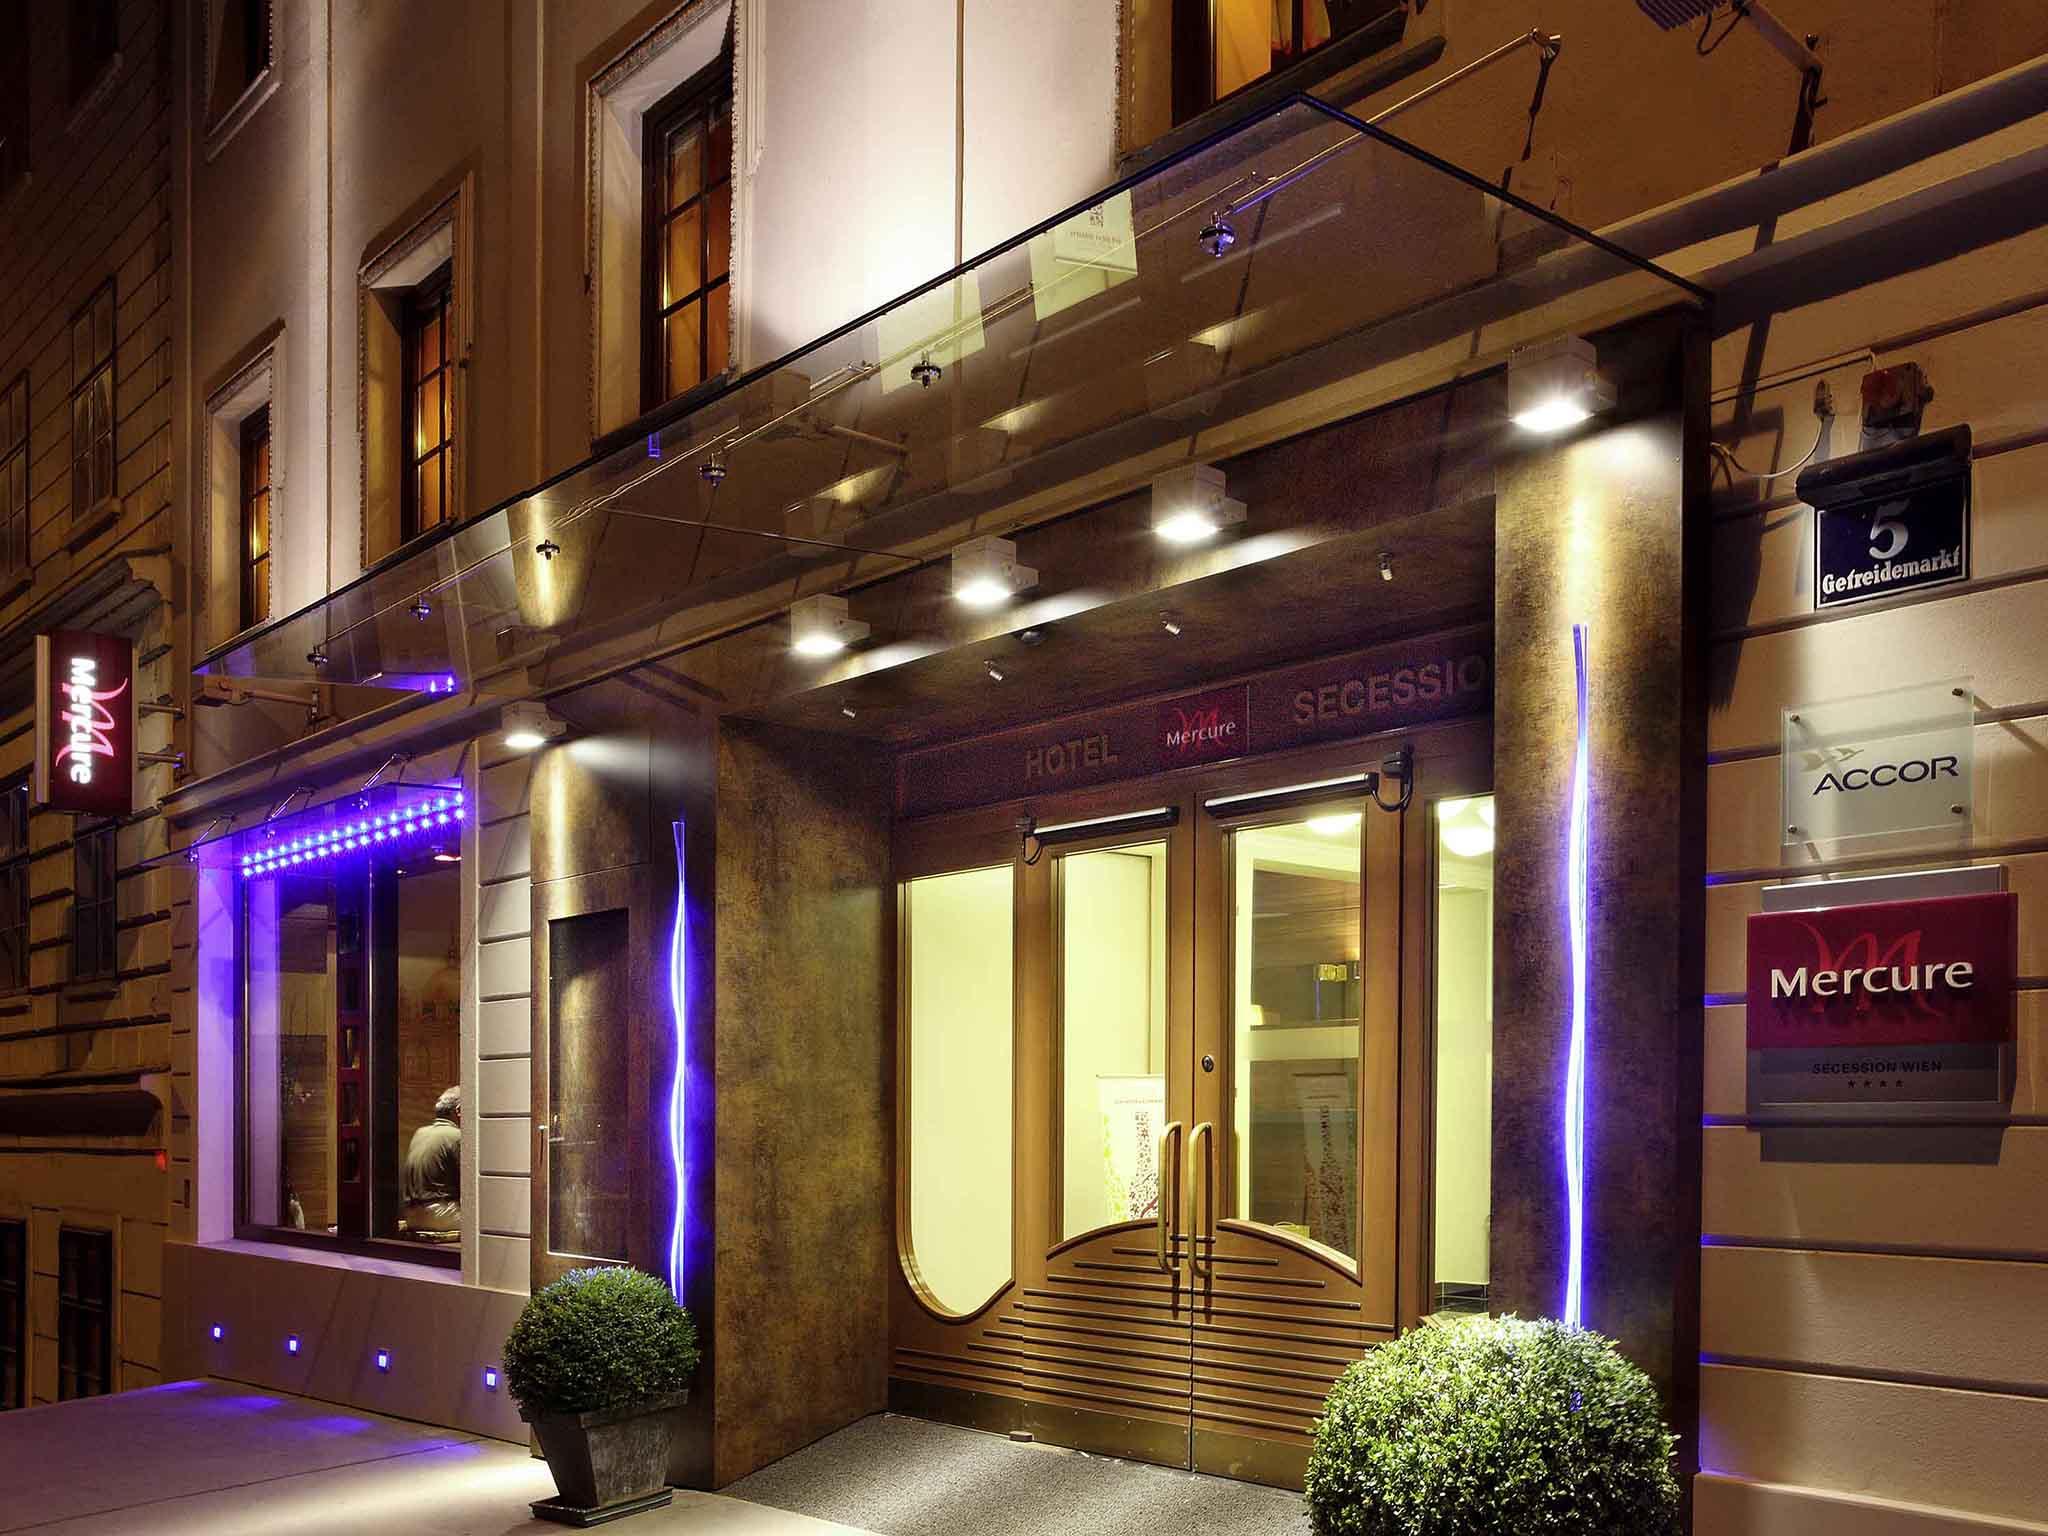 Hotell – Hotel Mercure Secession Wien